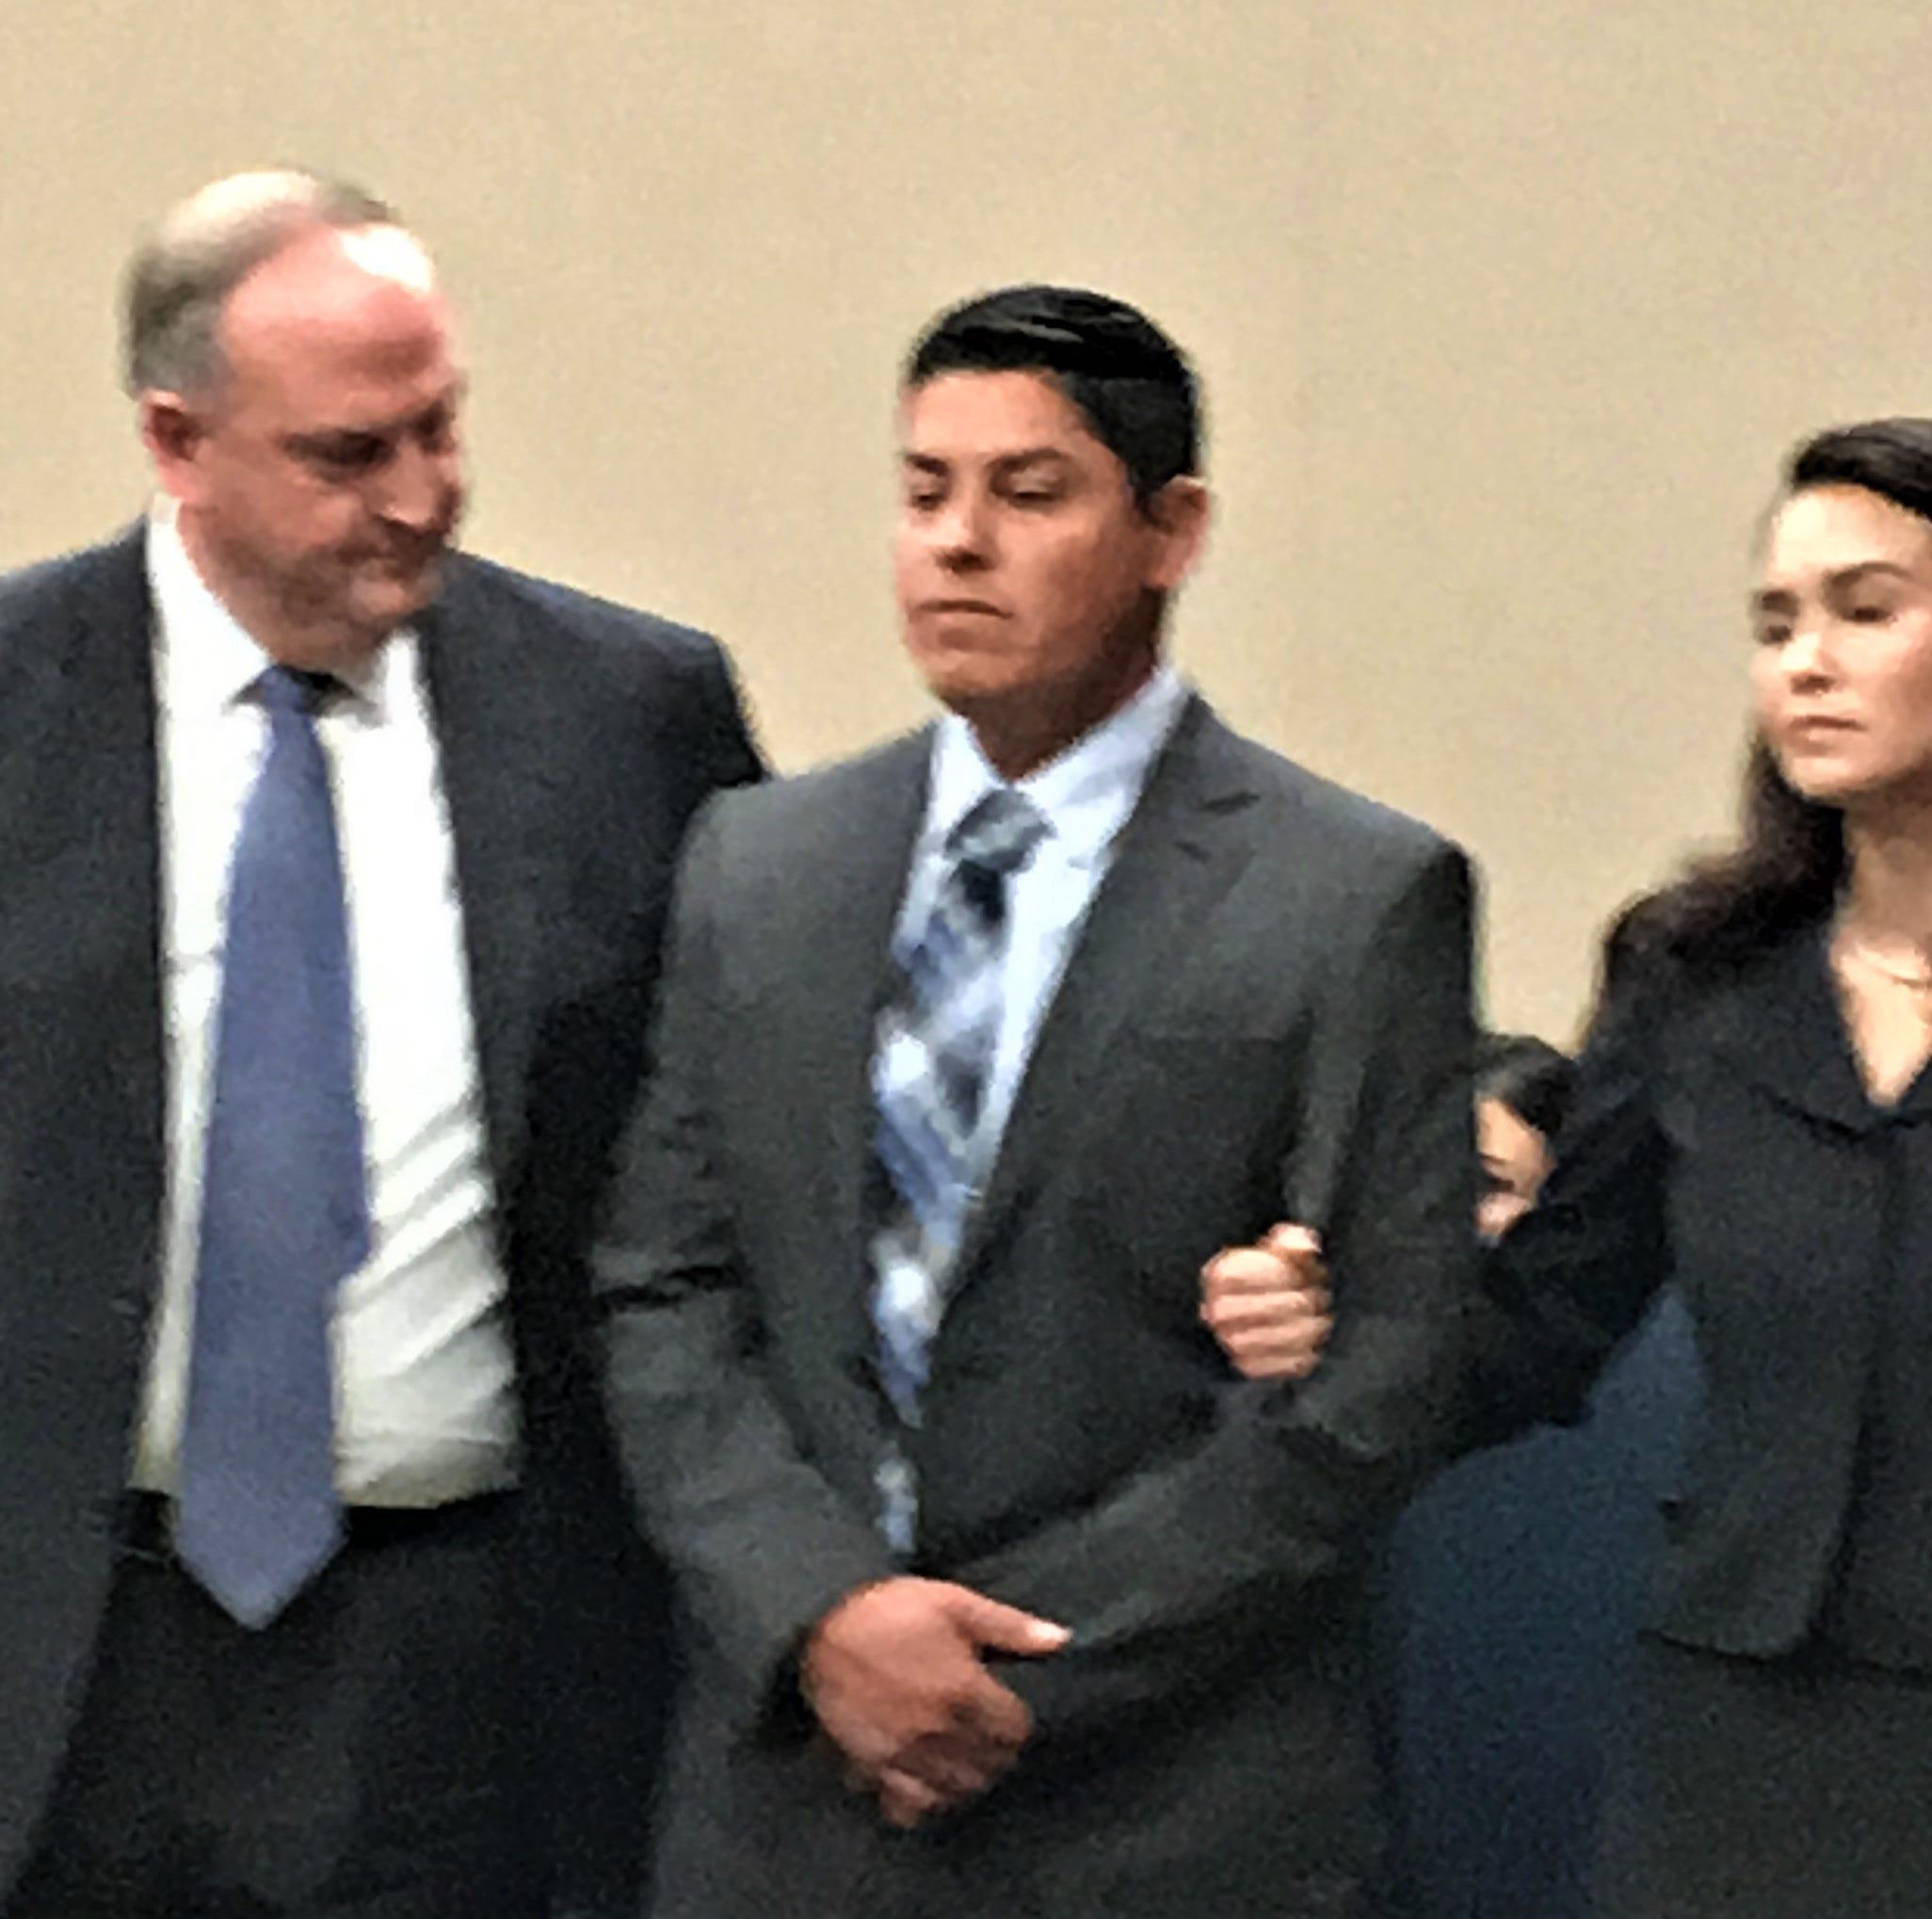 Leonel Hernandez found guilty in 2016 murder of former El Paso KLAQ DJ Richard Madrigal